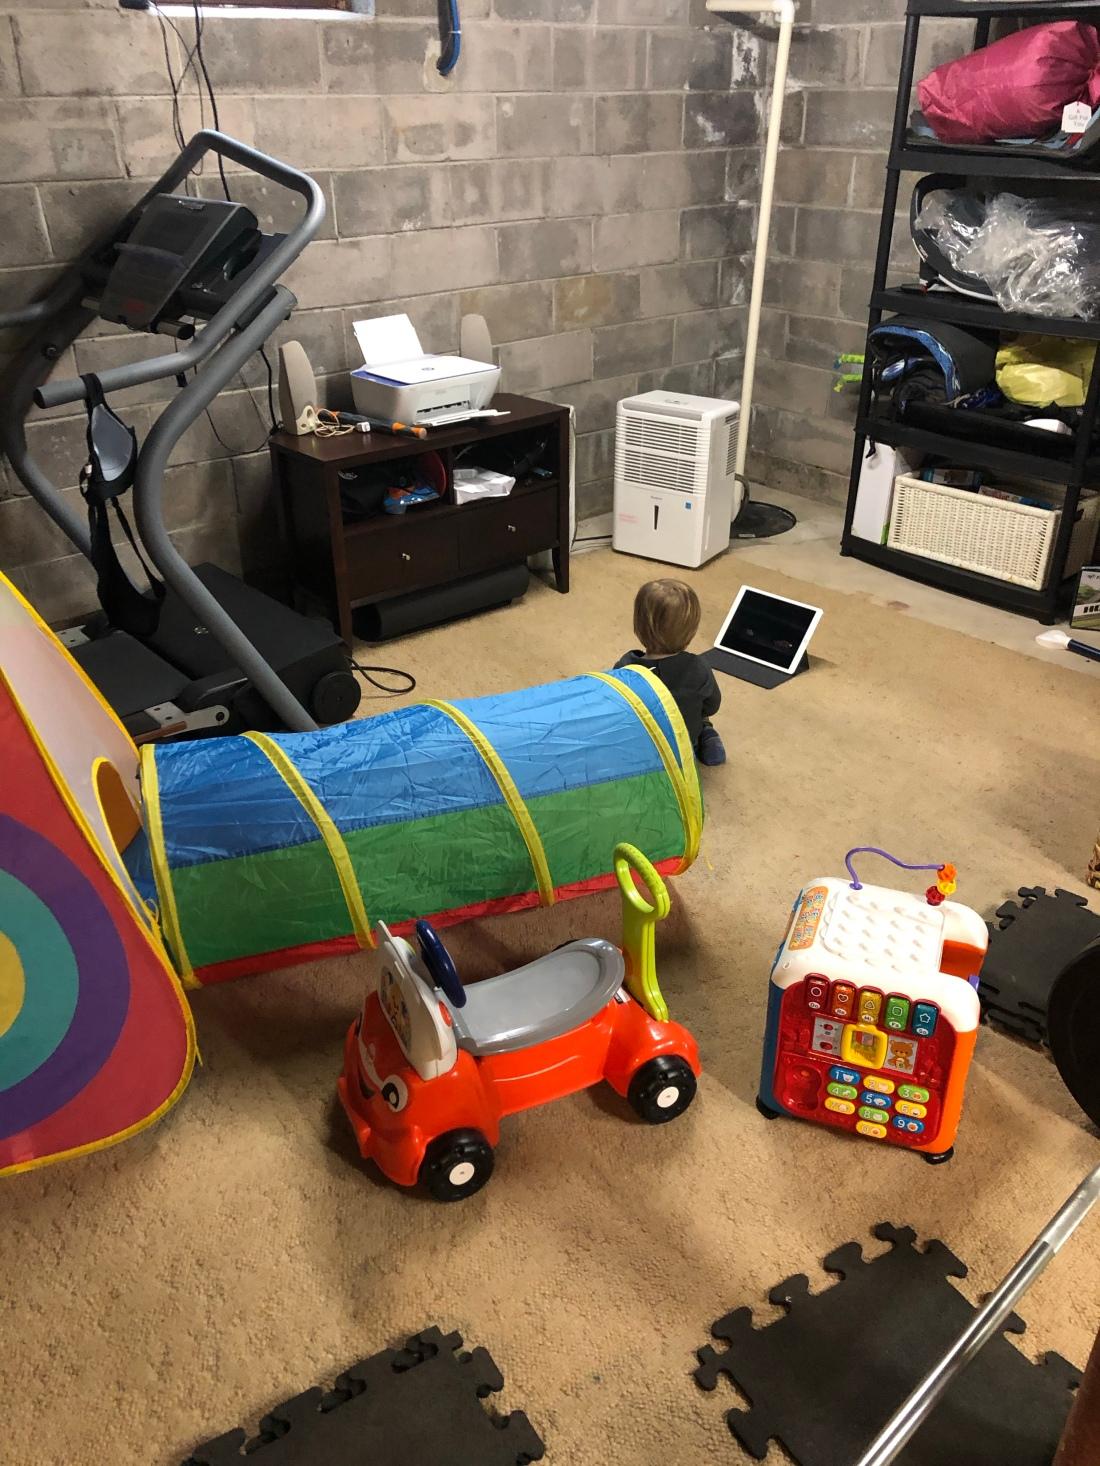 basement workout spin bike treadmill